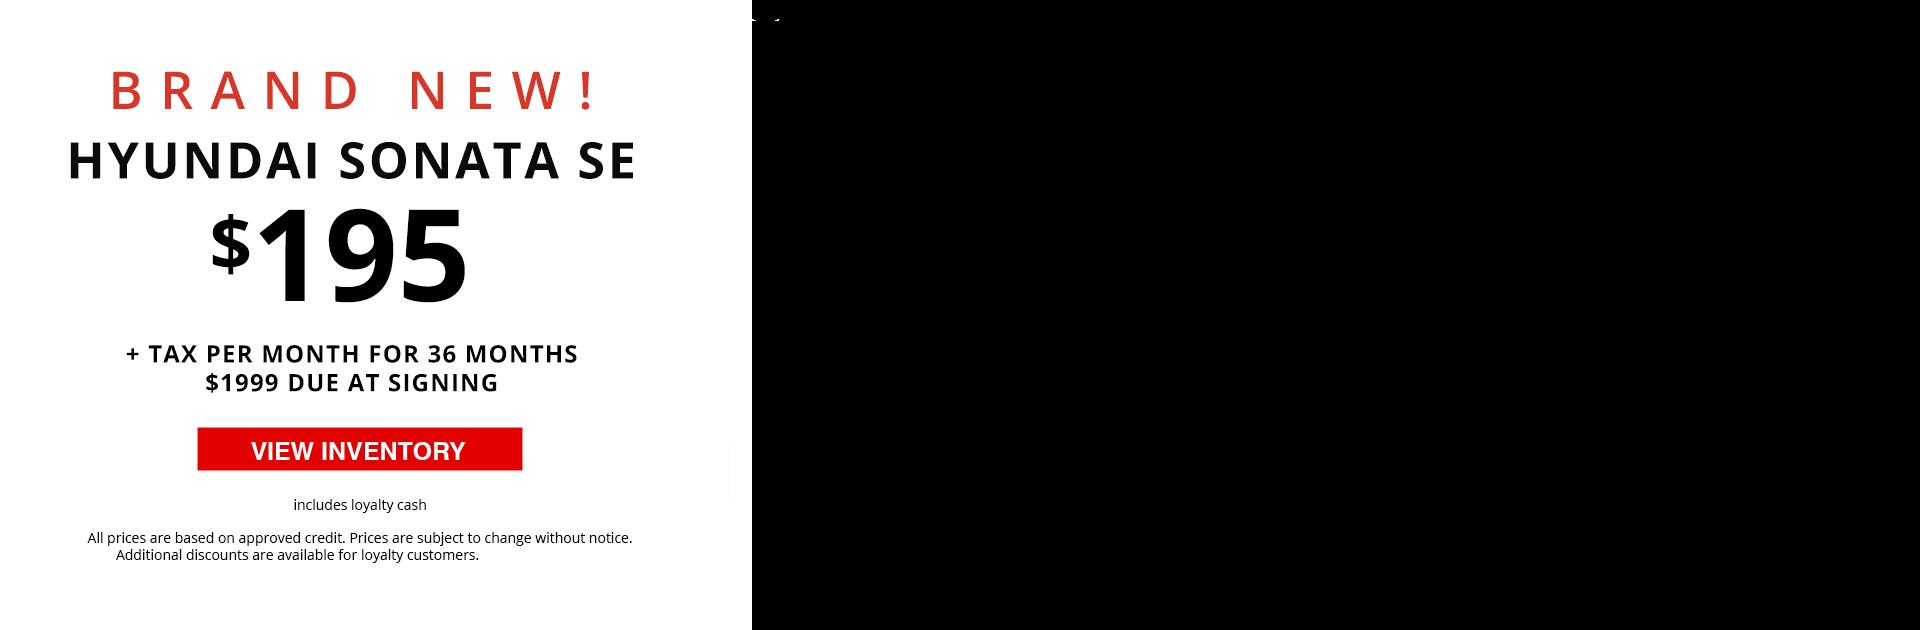 Video Banner - 2020 Hyundai Sonata SE